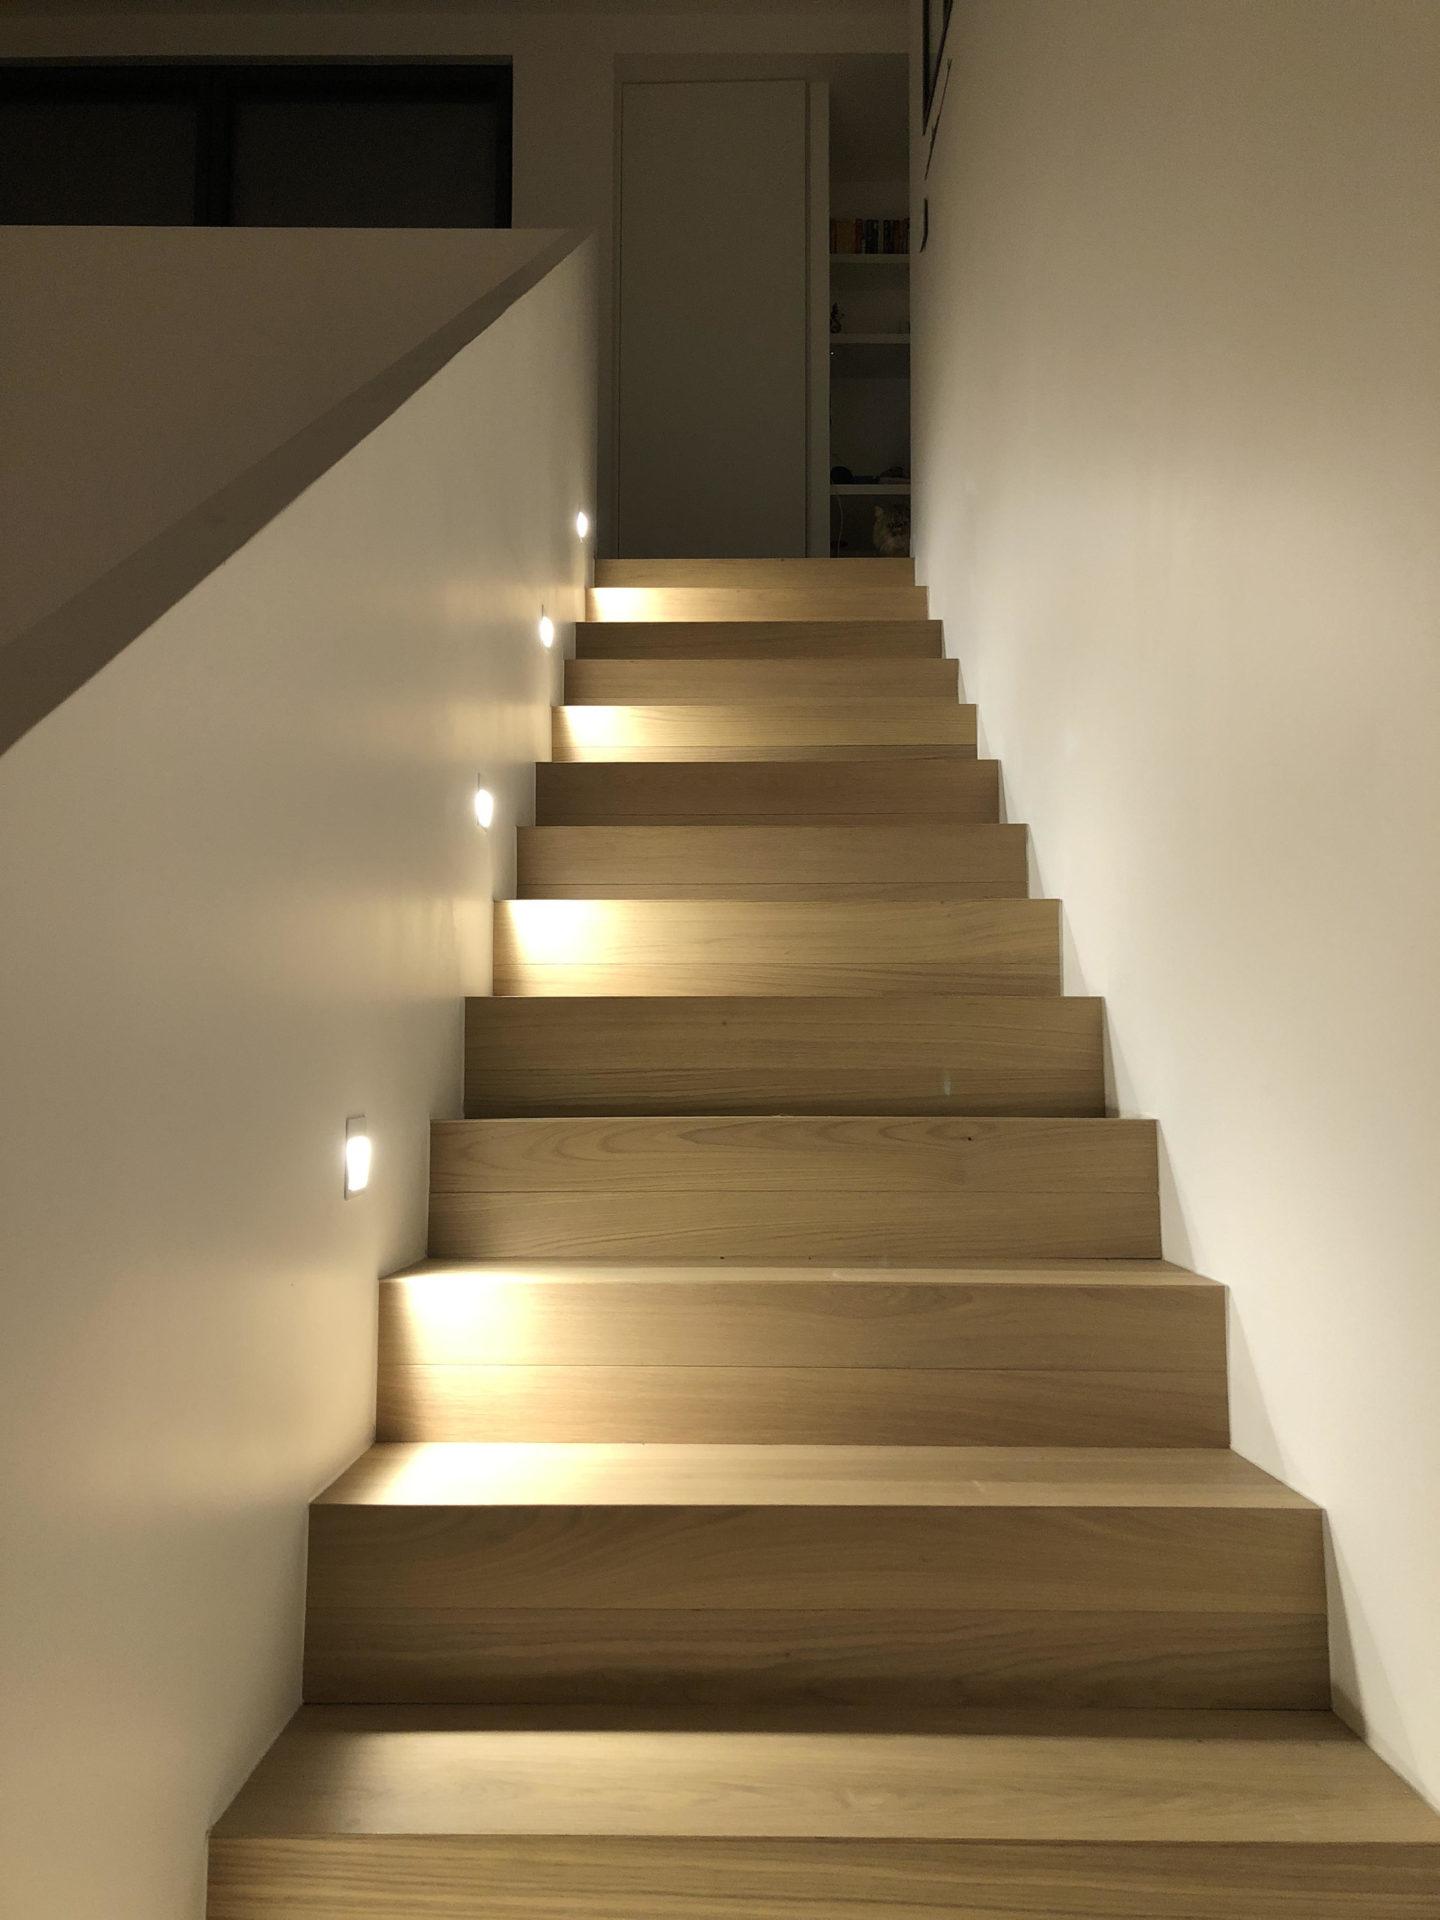 asb-architecture-maison-contemporaine-toiture-terrasse-escalier contemporain